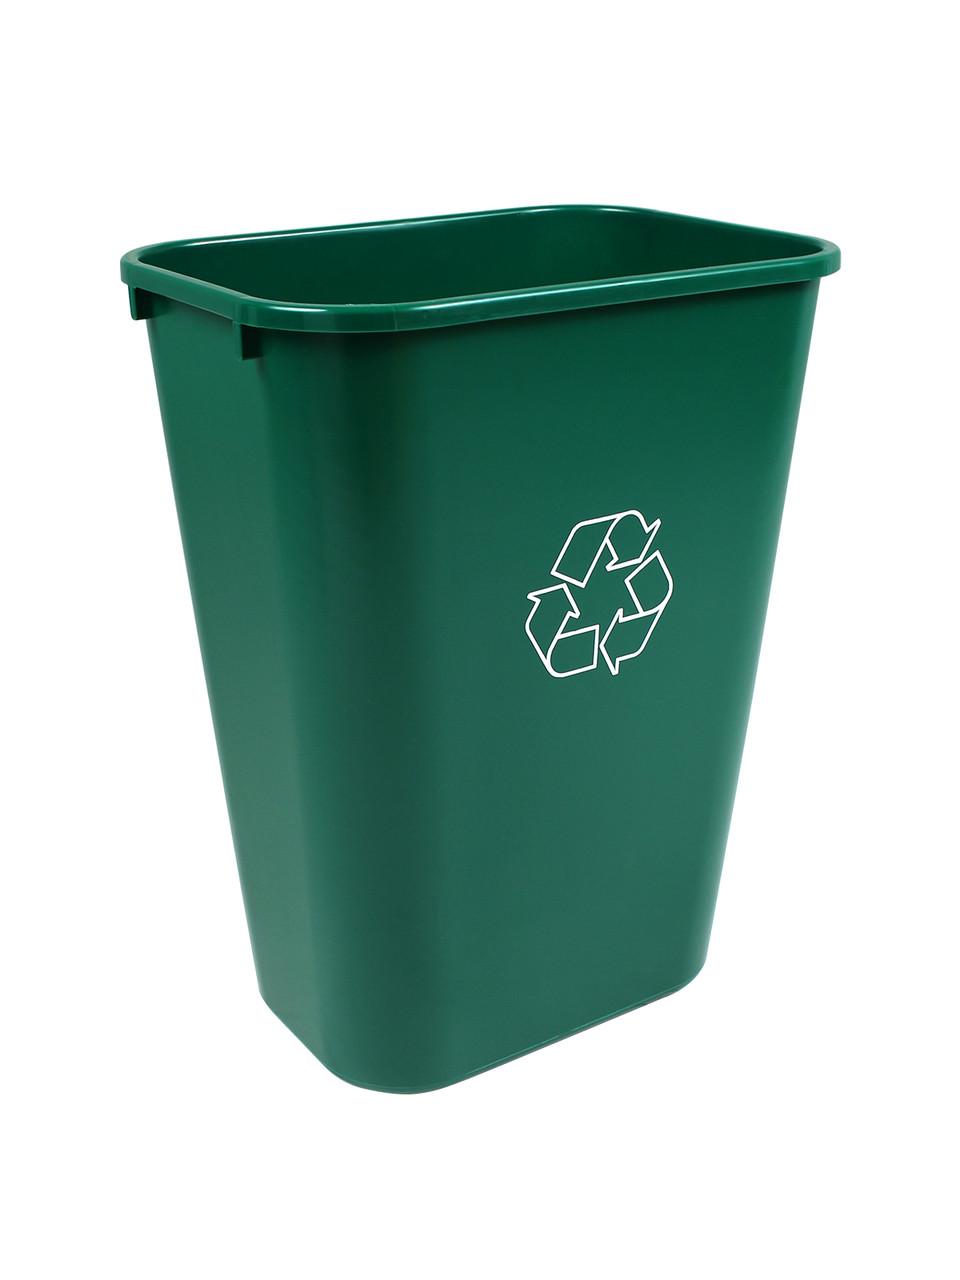 41 Quart Green Recycling Bin Waste Basket 41QGRN